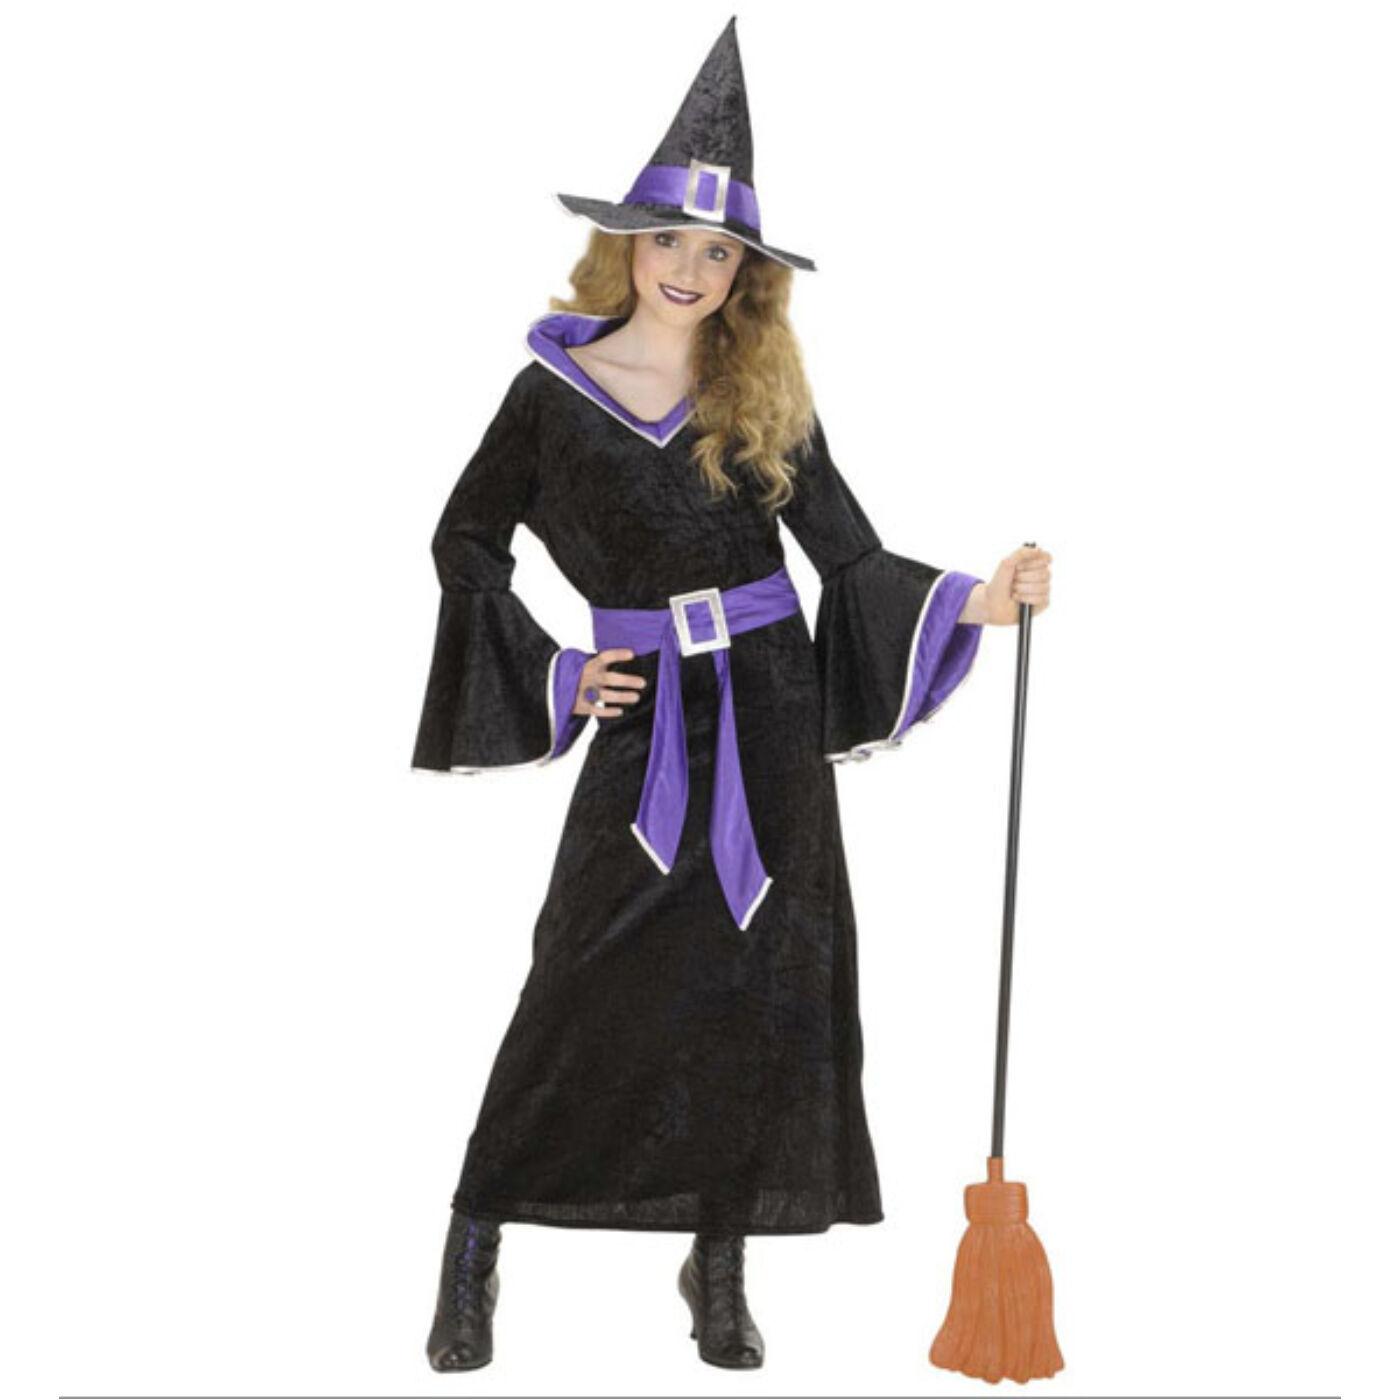 Lila boszorkány jelmez 128-as